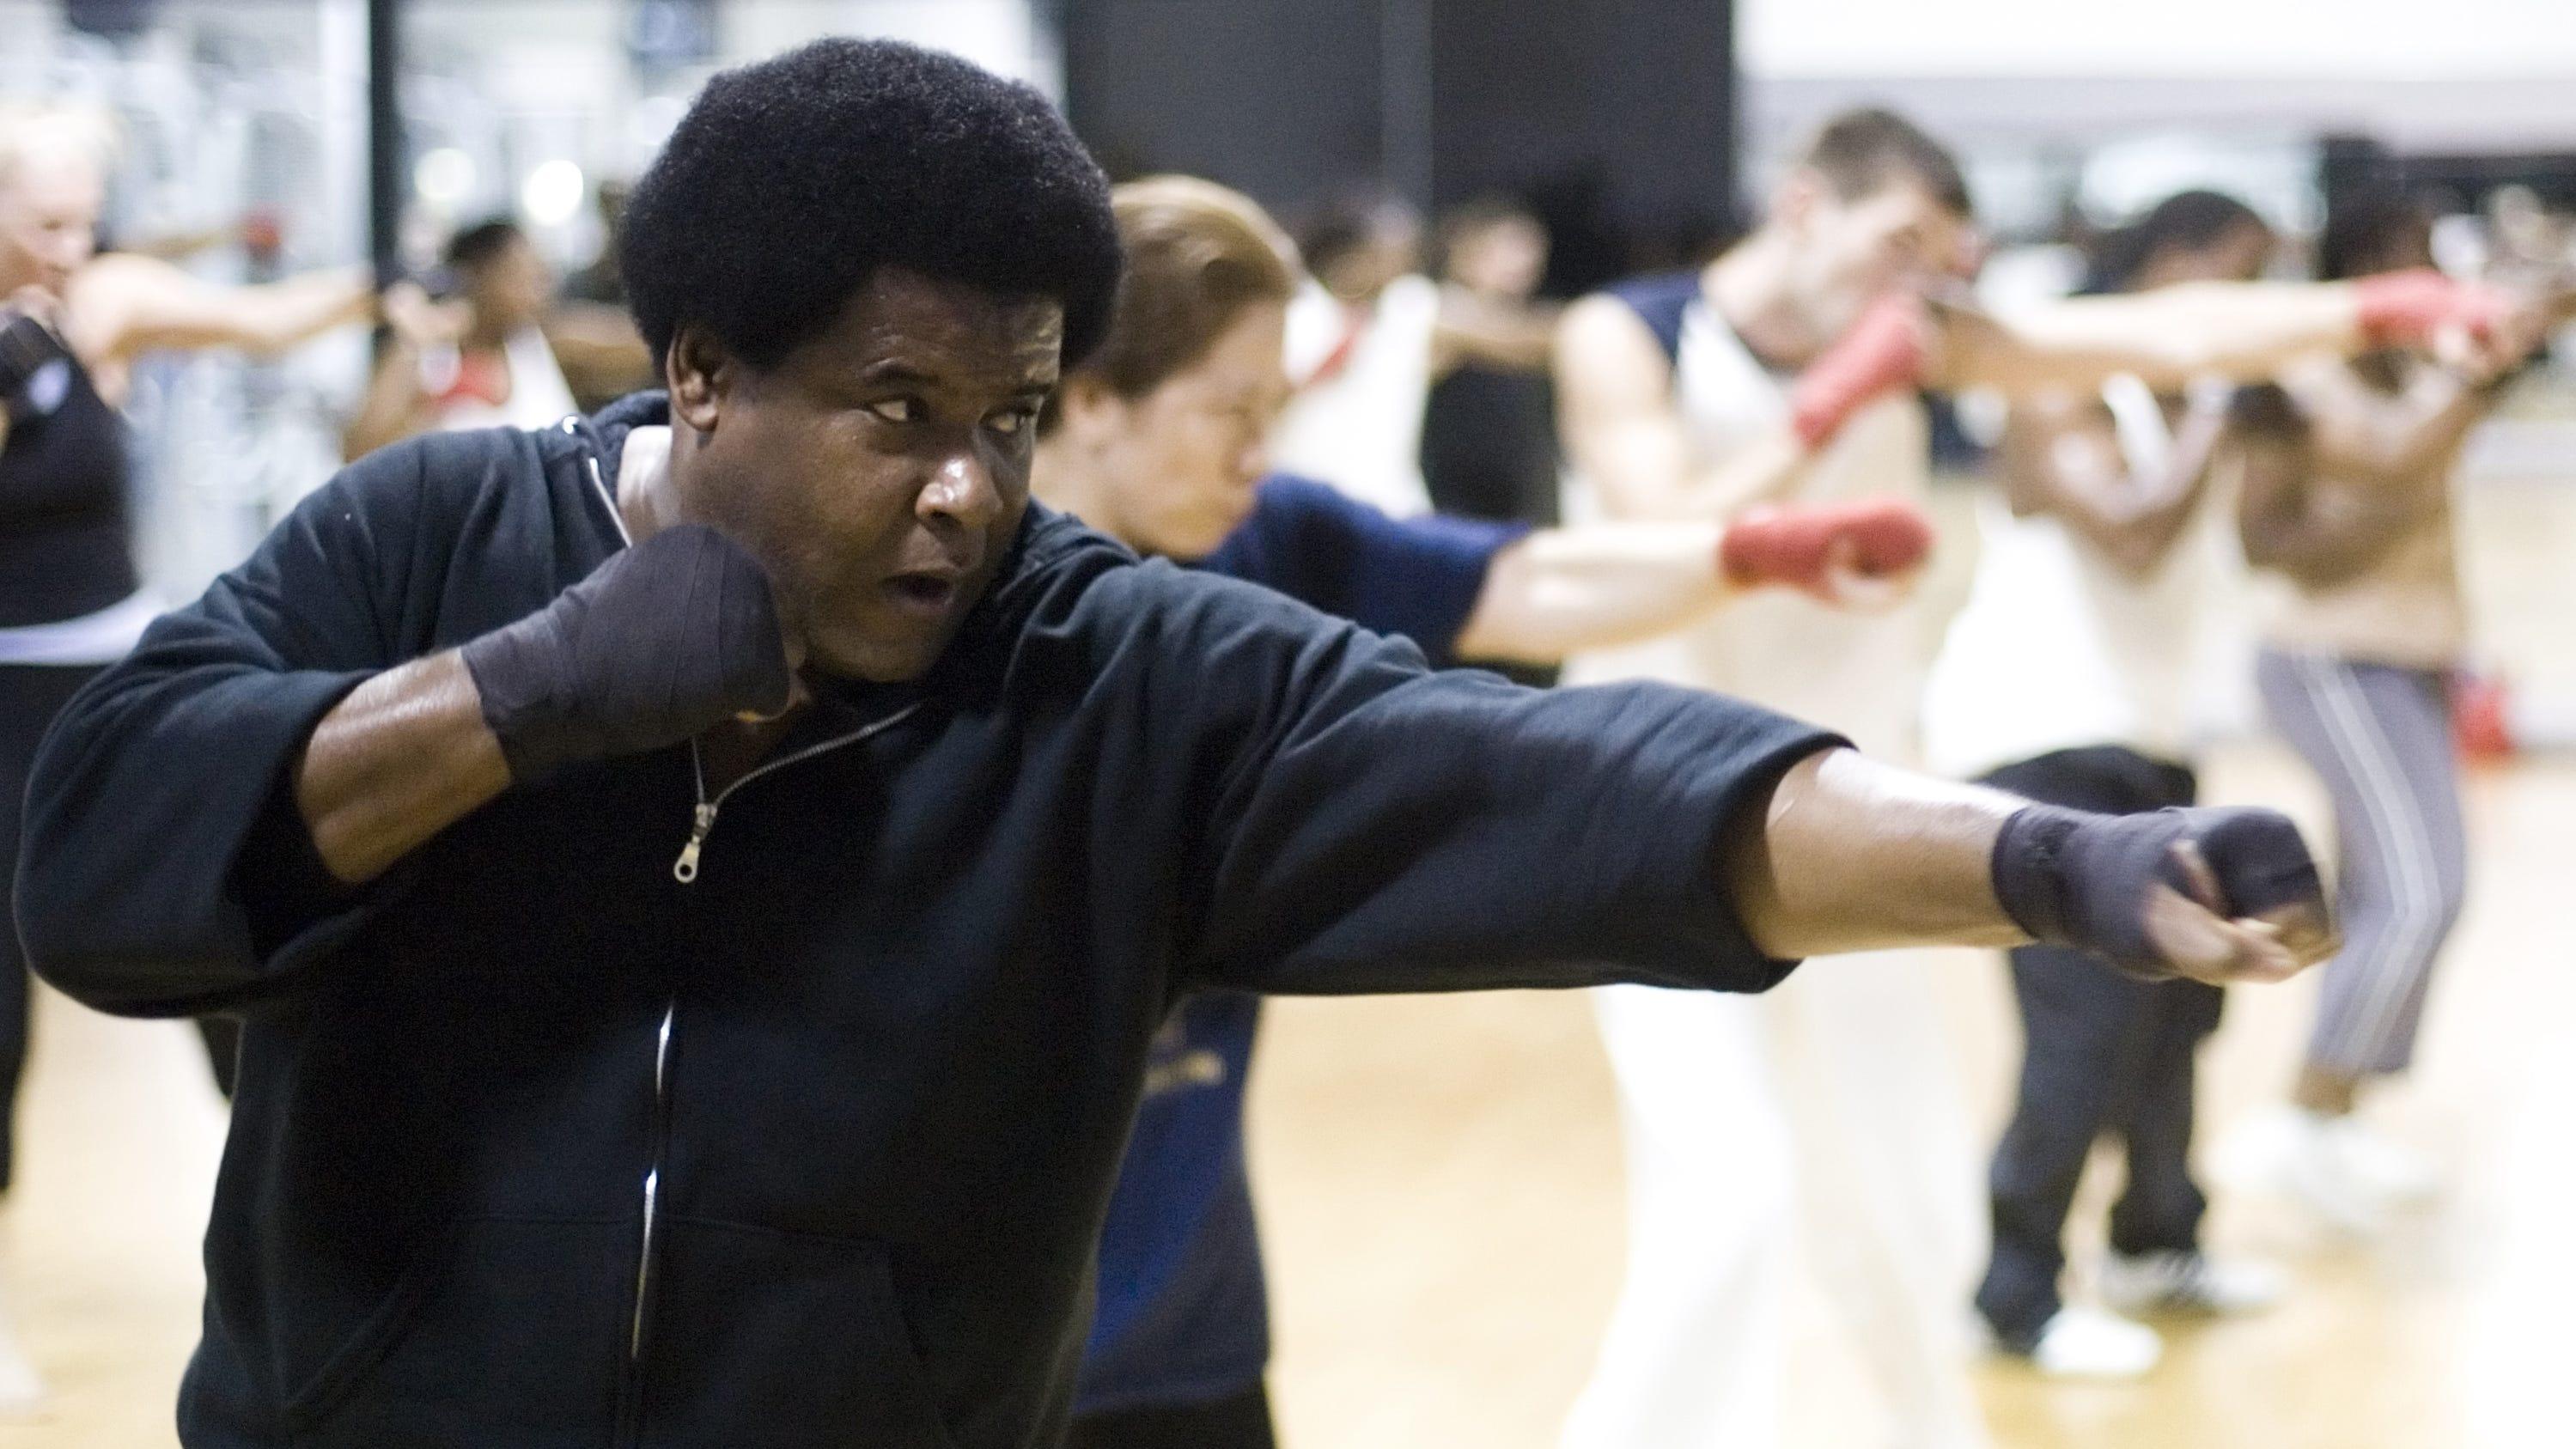 Gerald Murphy leads a kickboxing class on Nov. 13, 2007.